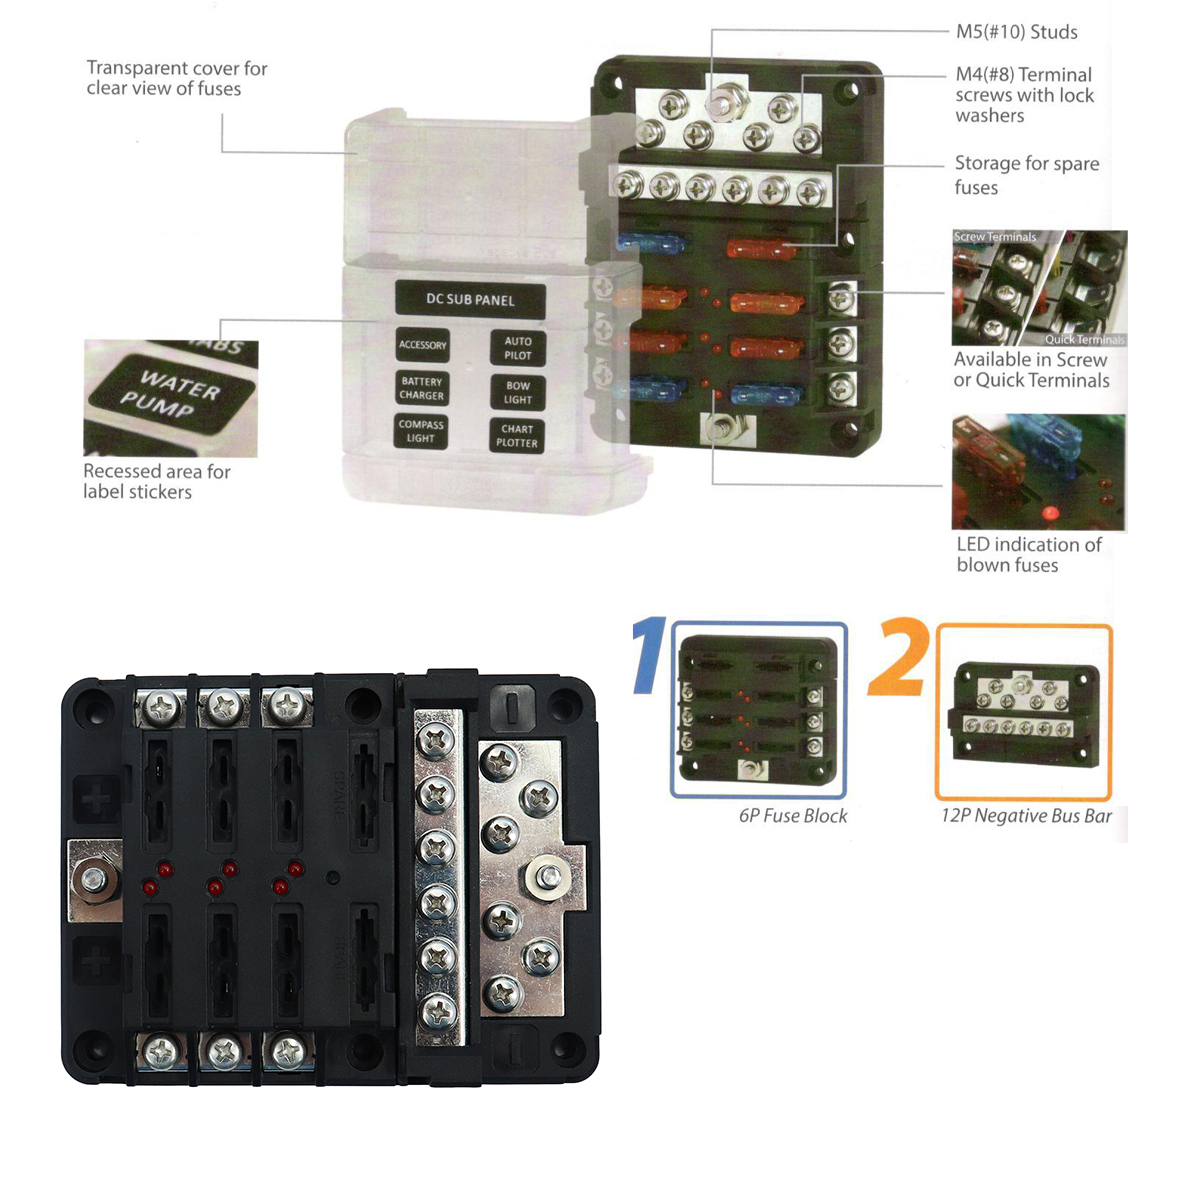 hight resolution of f3618 dc fuse box with lamp 12 bit negative common box modular fl70 fuse holder diagram